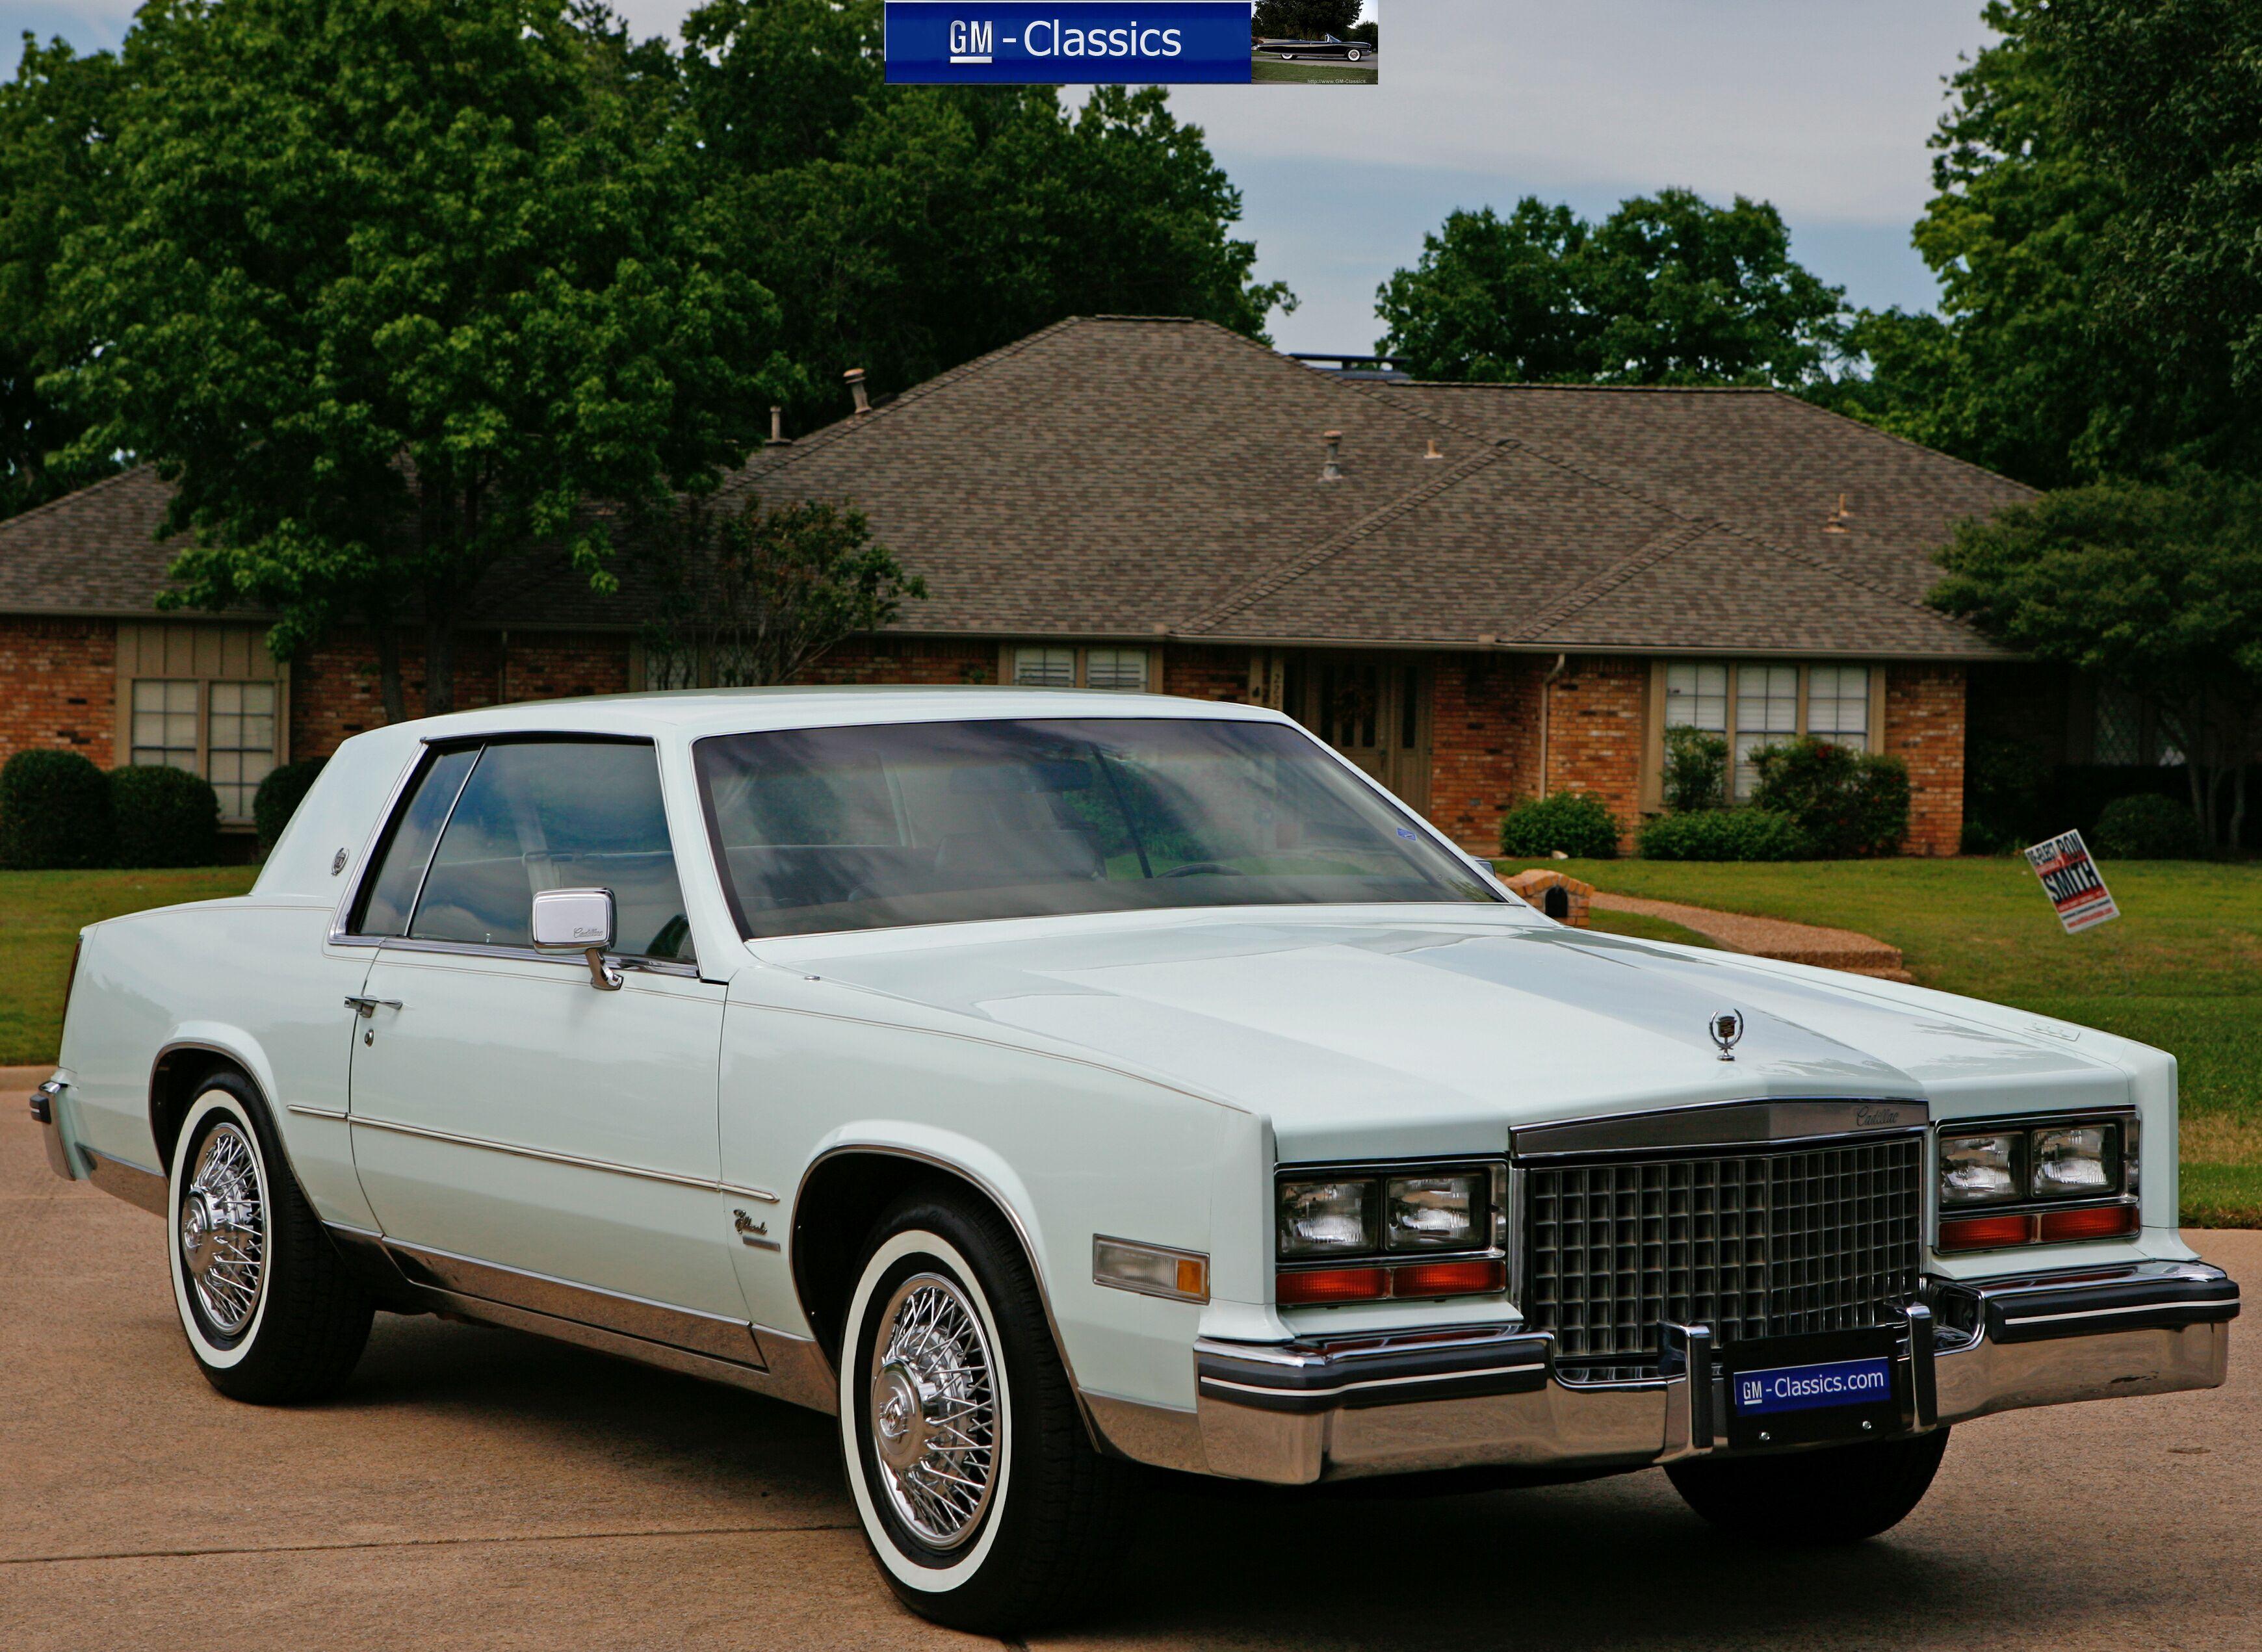 1980 cadillac eldorado touring coupe matt garrett 80 Cadillac Fleetwood